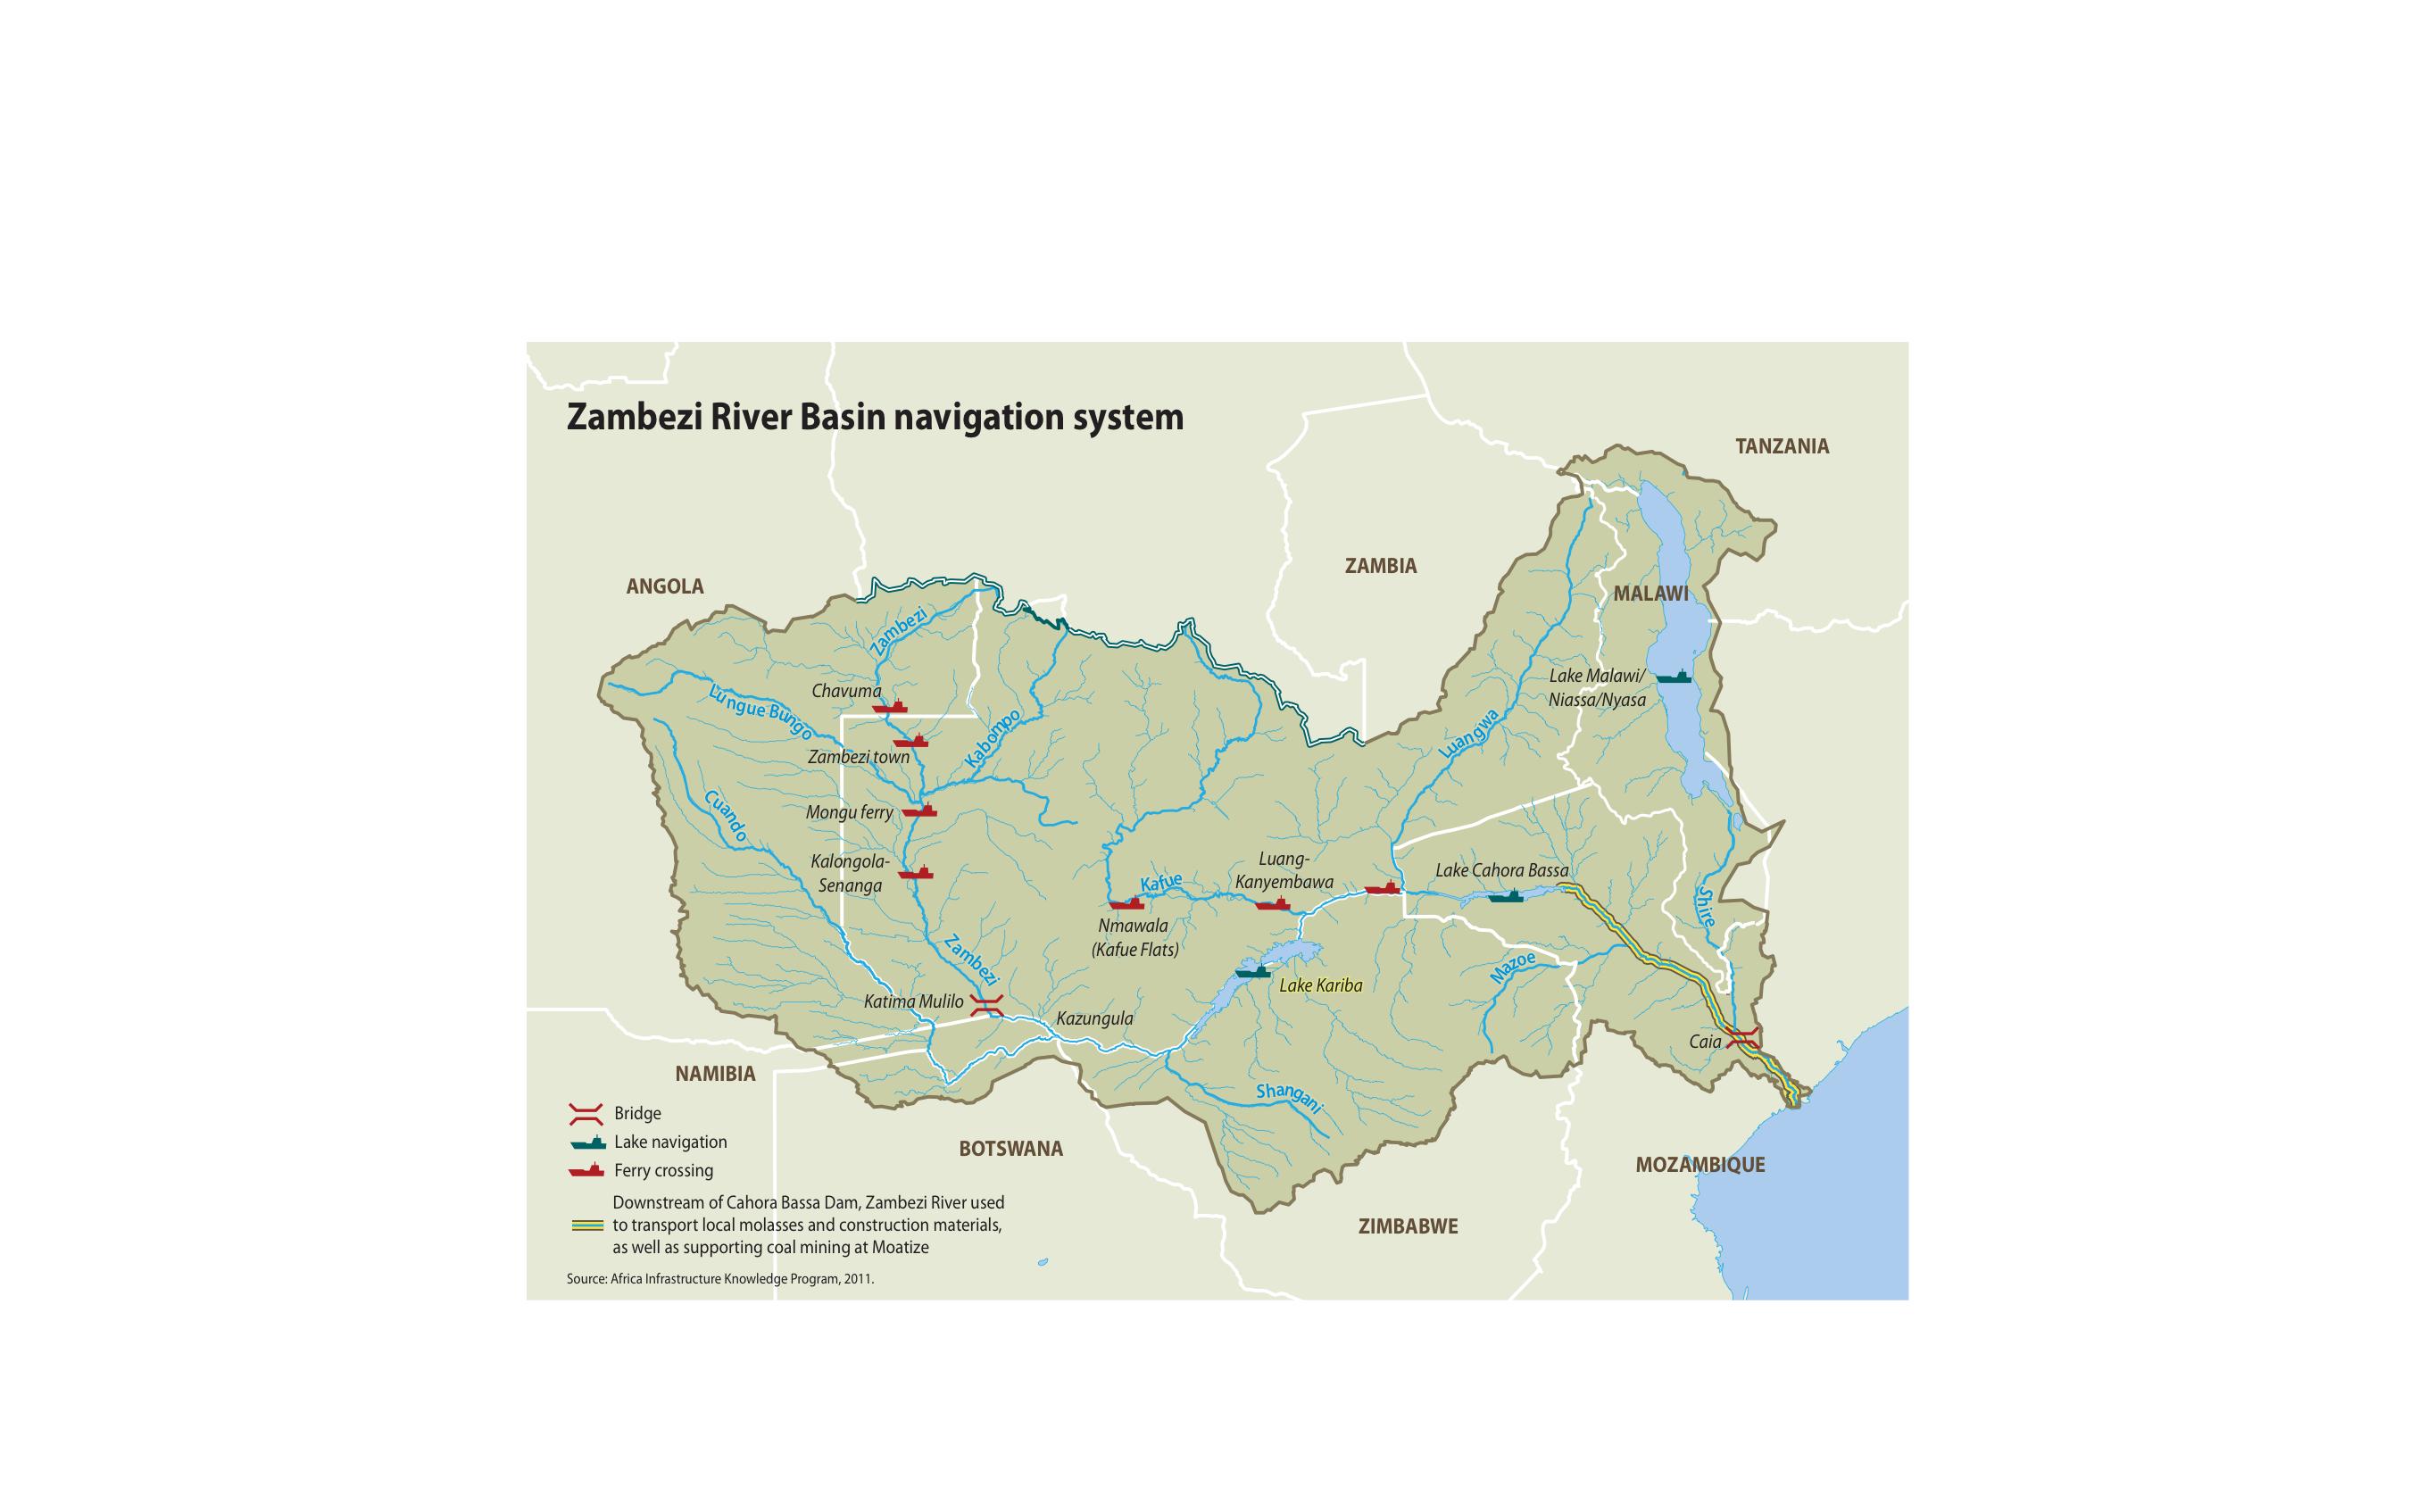 Zambezi River On Map Of Africa.Zambezi River Basin Navigation System Grid Arendal